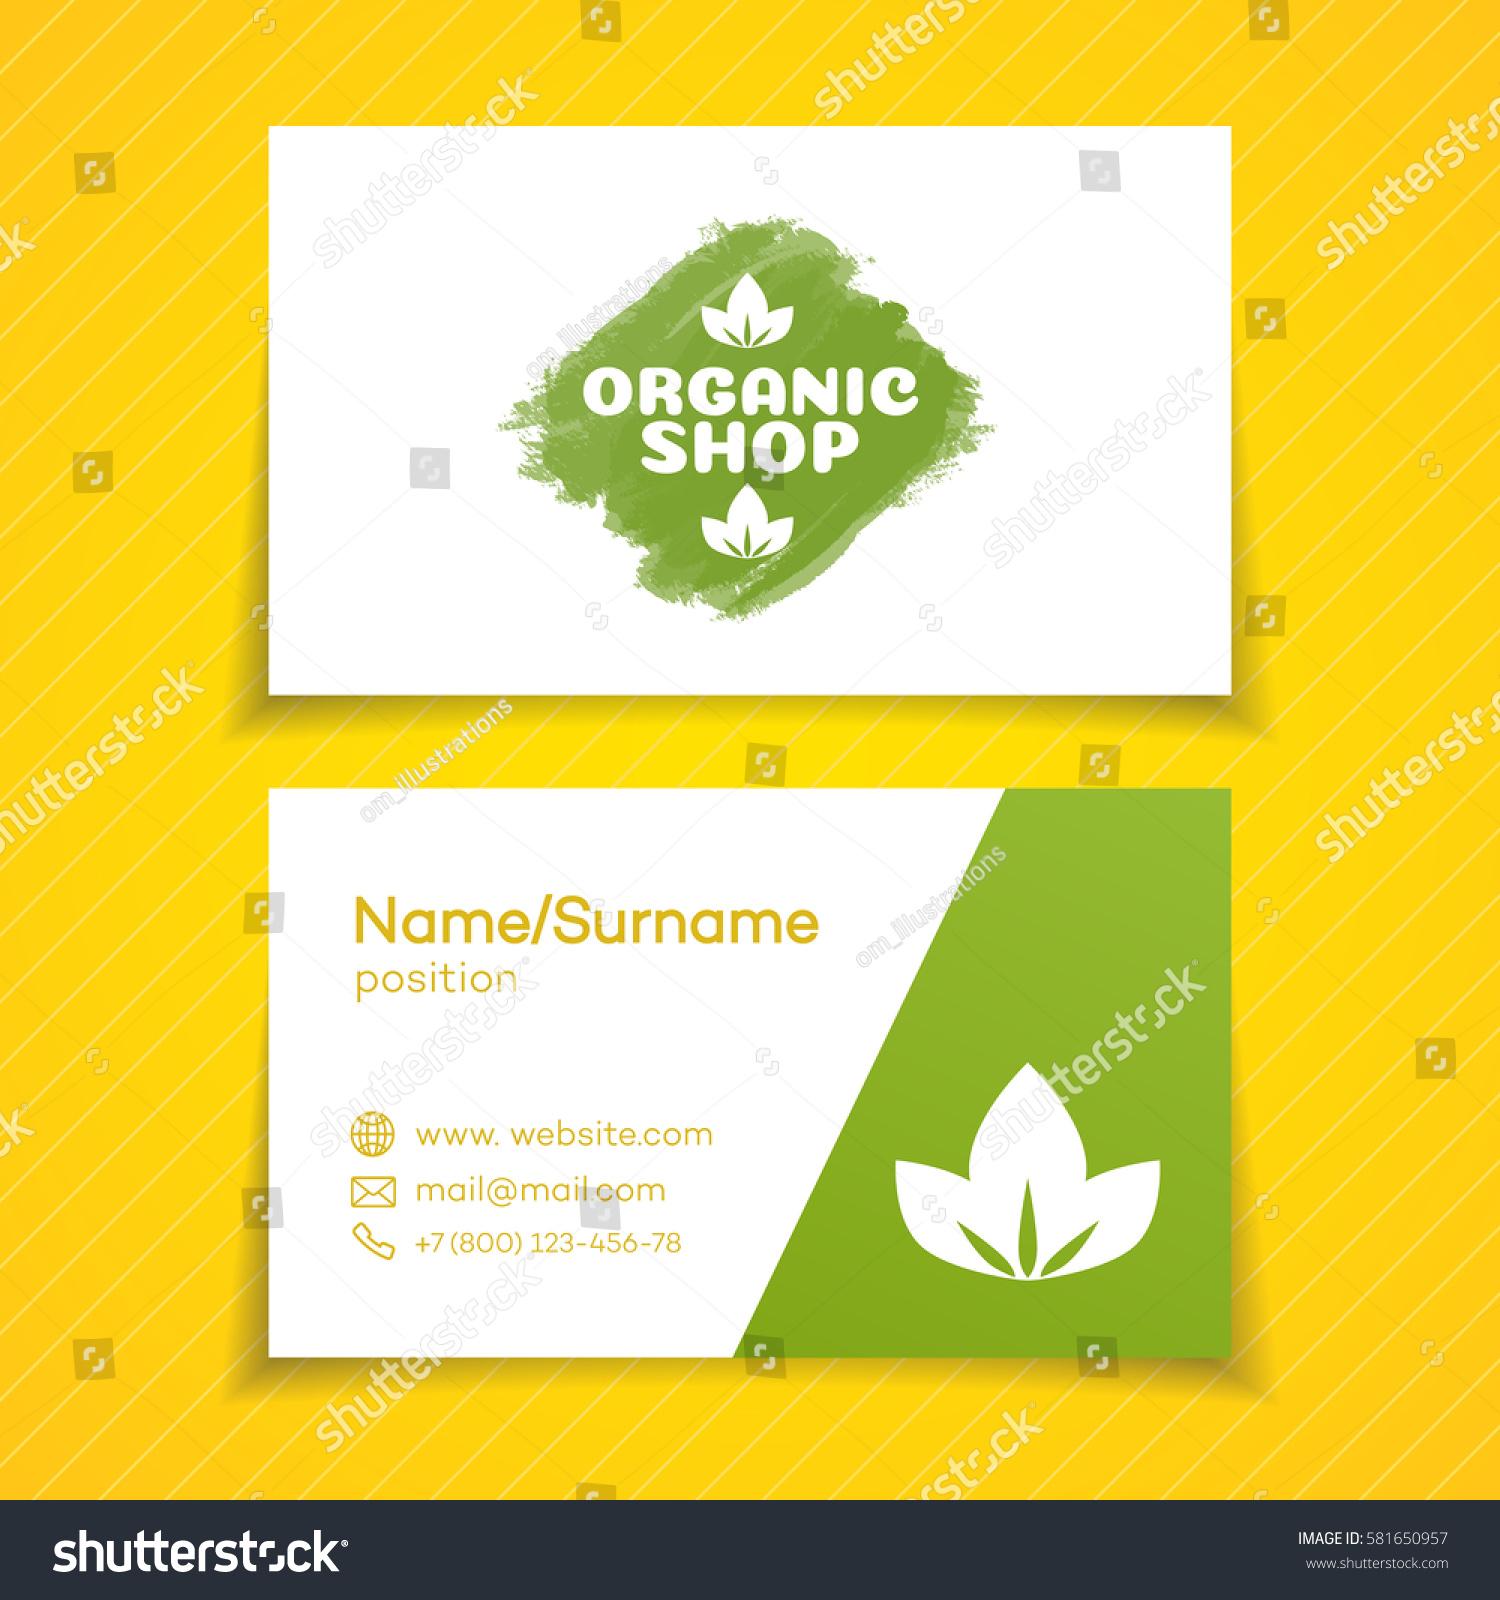 Business Card Organic Shop Logo Use Stock Vector Royalty Free